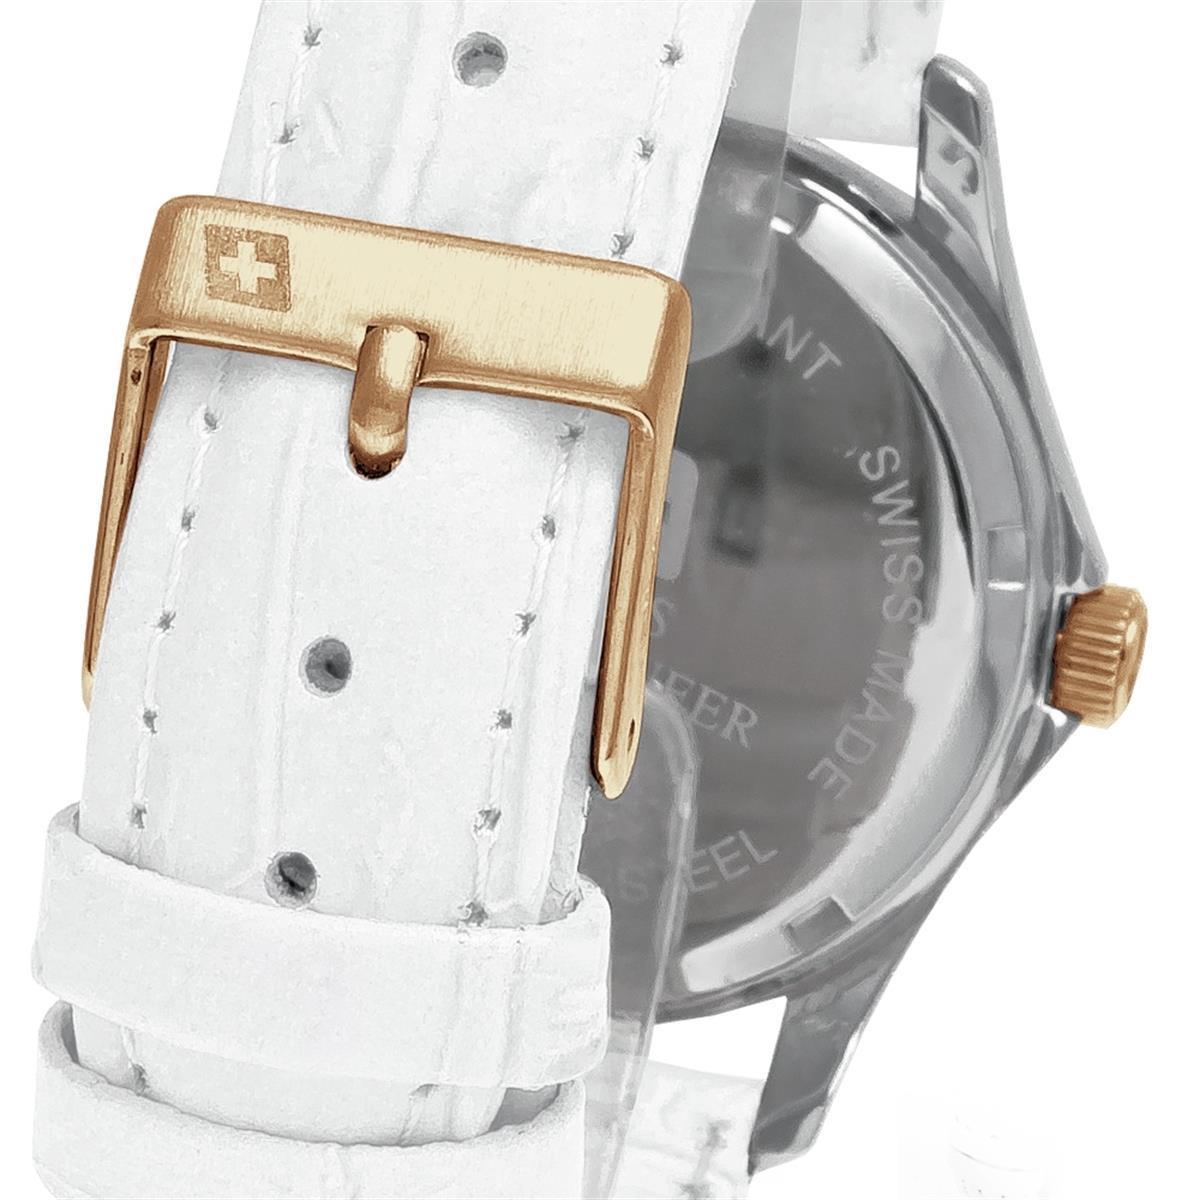 c93996a4f60 Relógio Feminino Swiss Mountaineer Classic Analógico SML8050 Couro